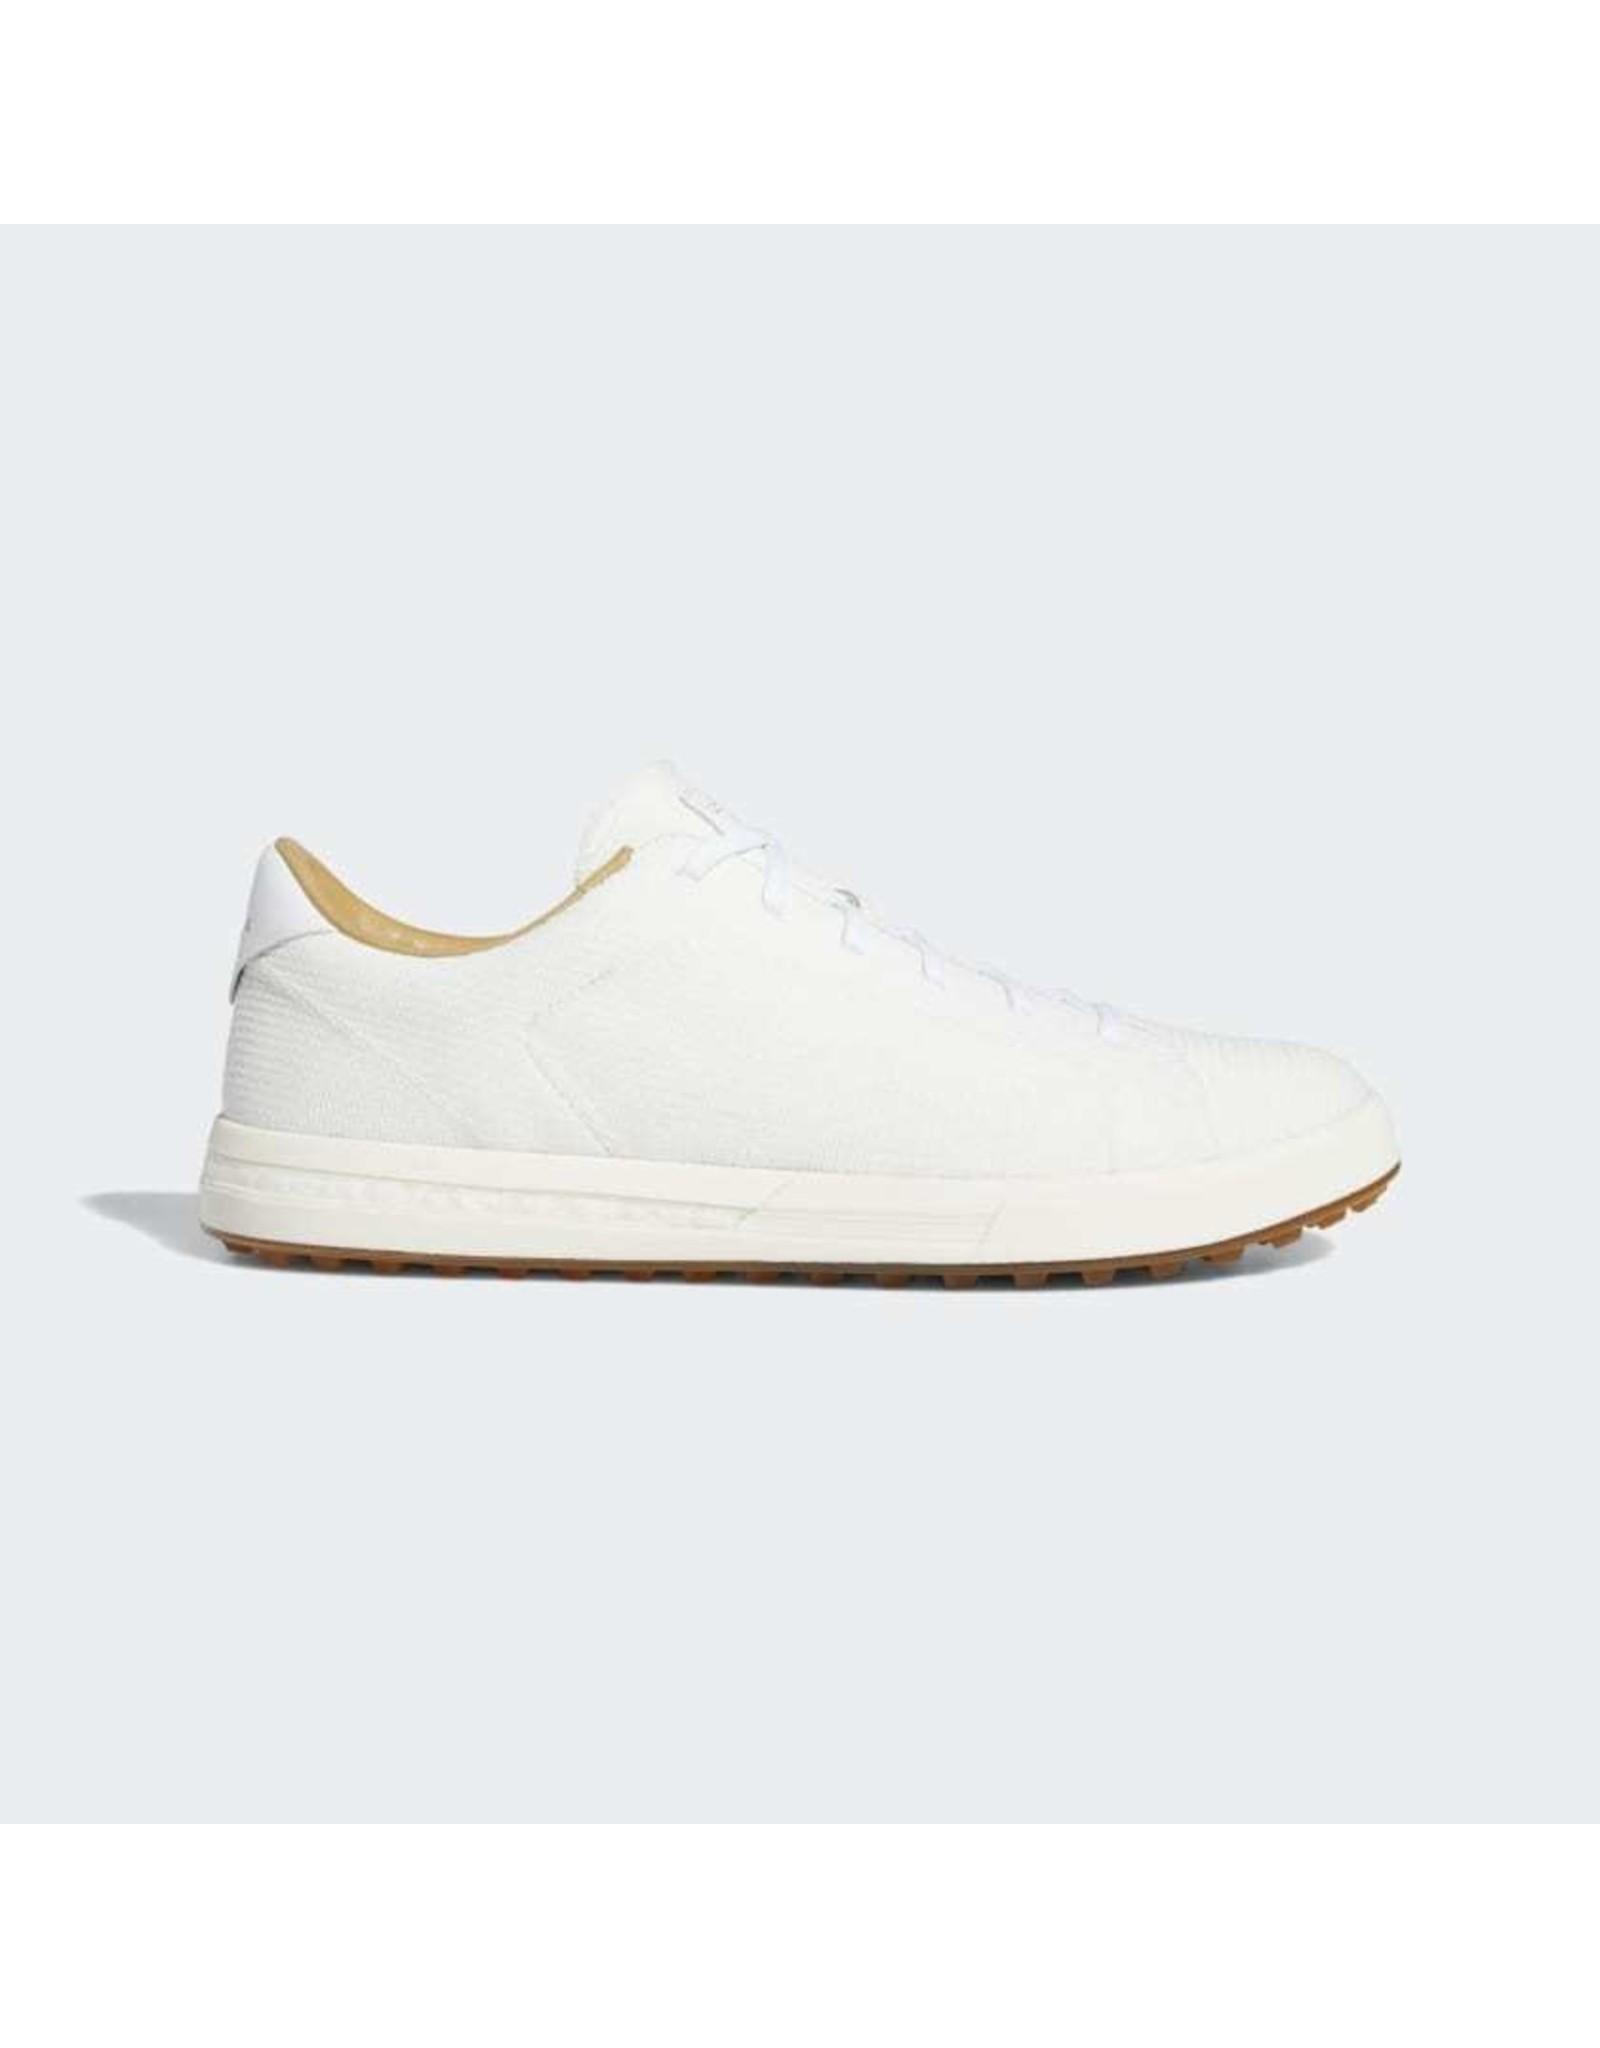 Adidas Adidas Adipure White